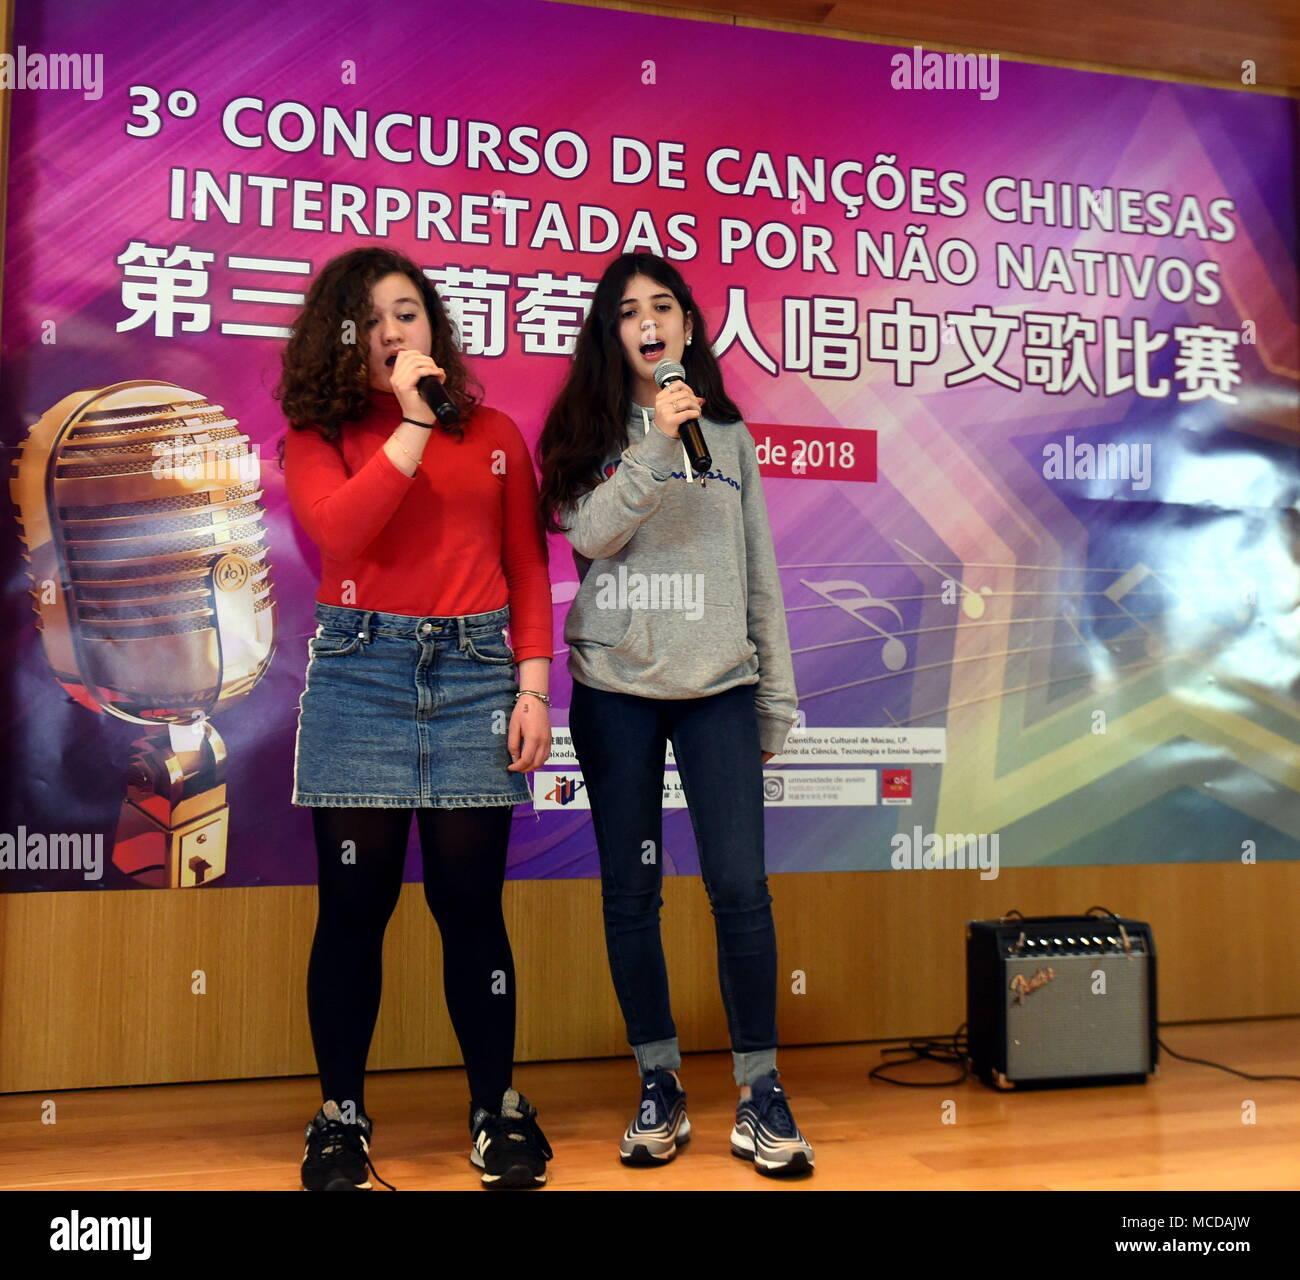 Lisbon, Portugal  15th Apr, 2018  The Portuguese contestants